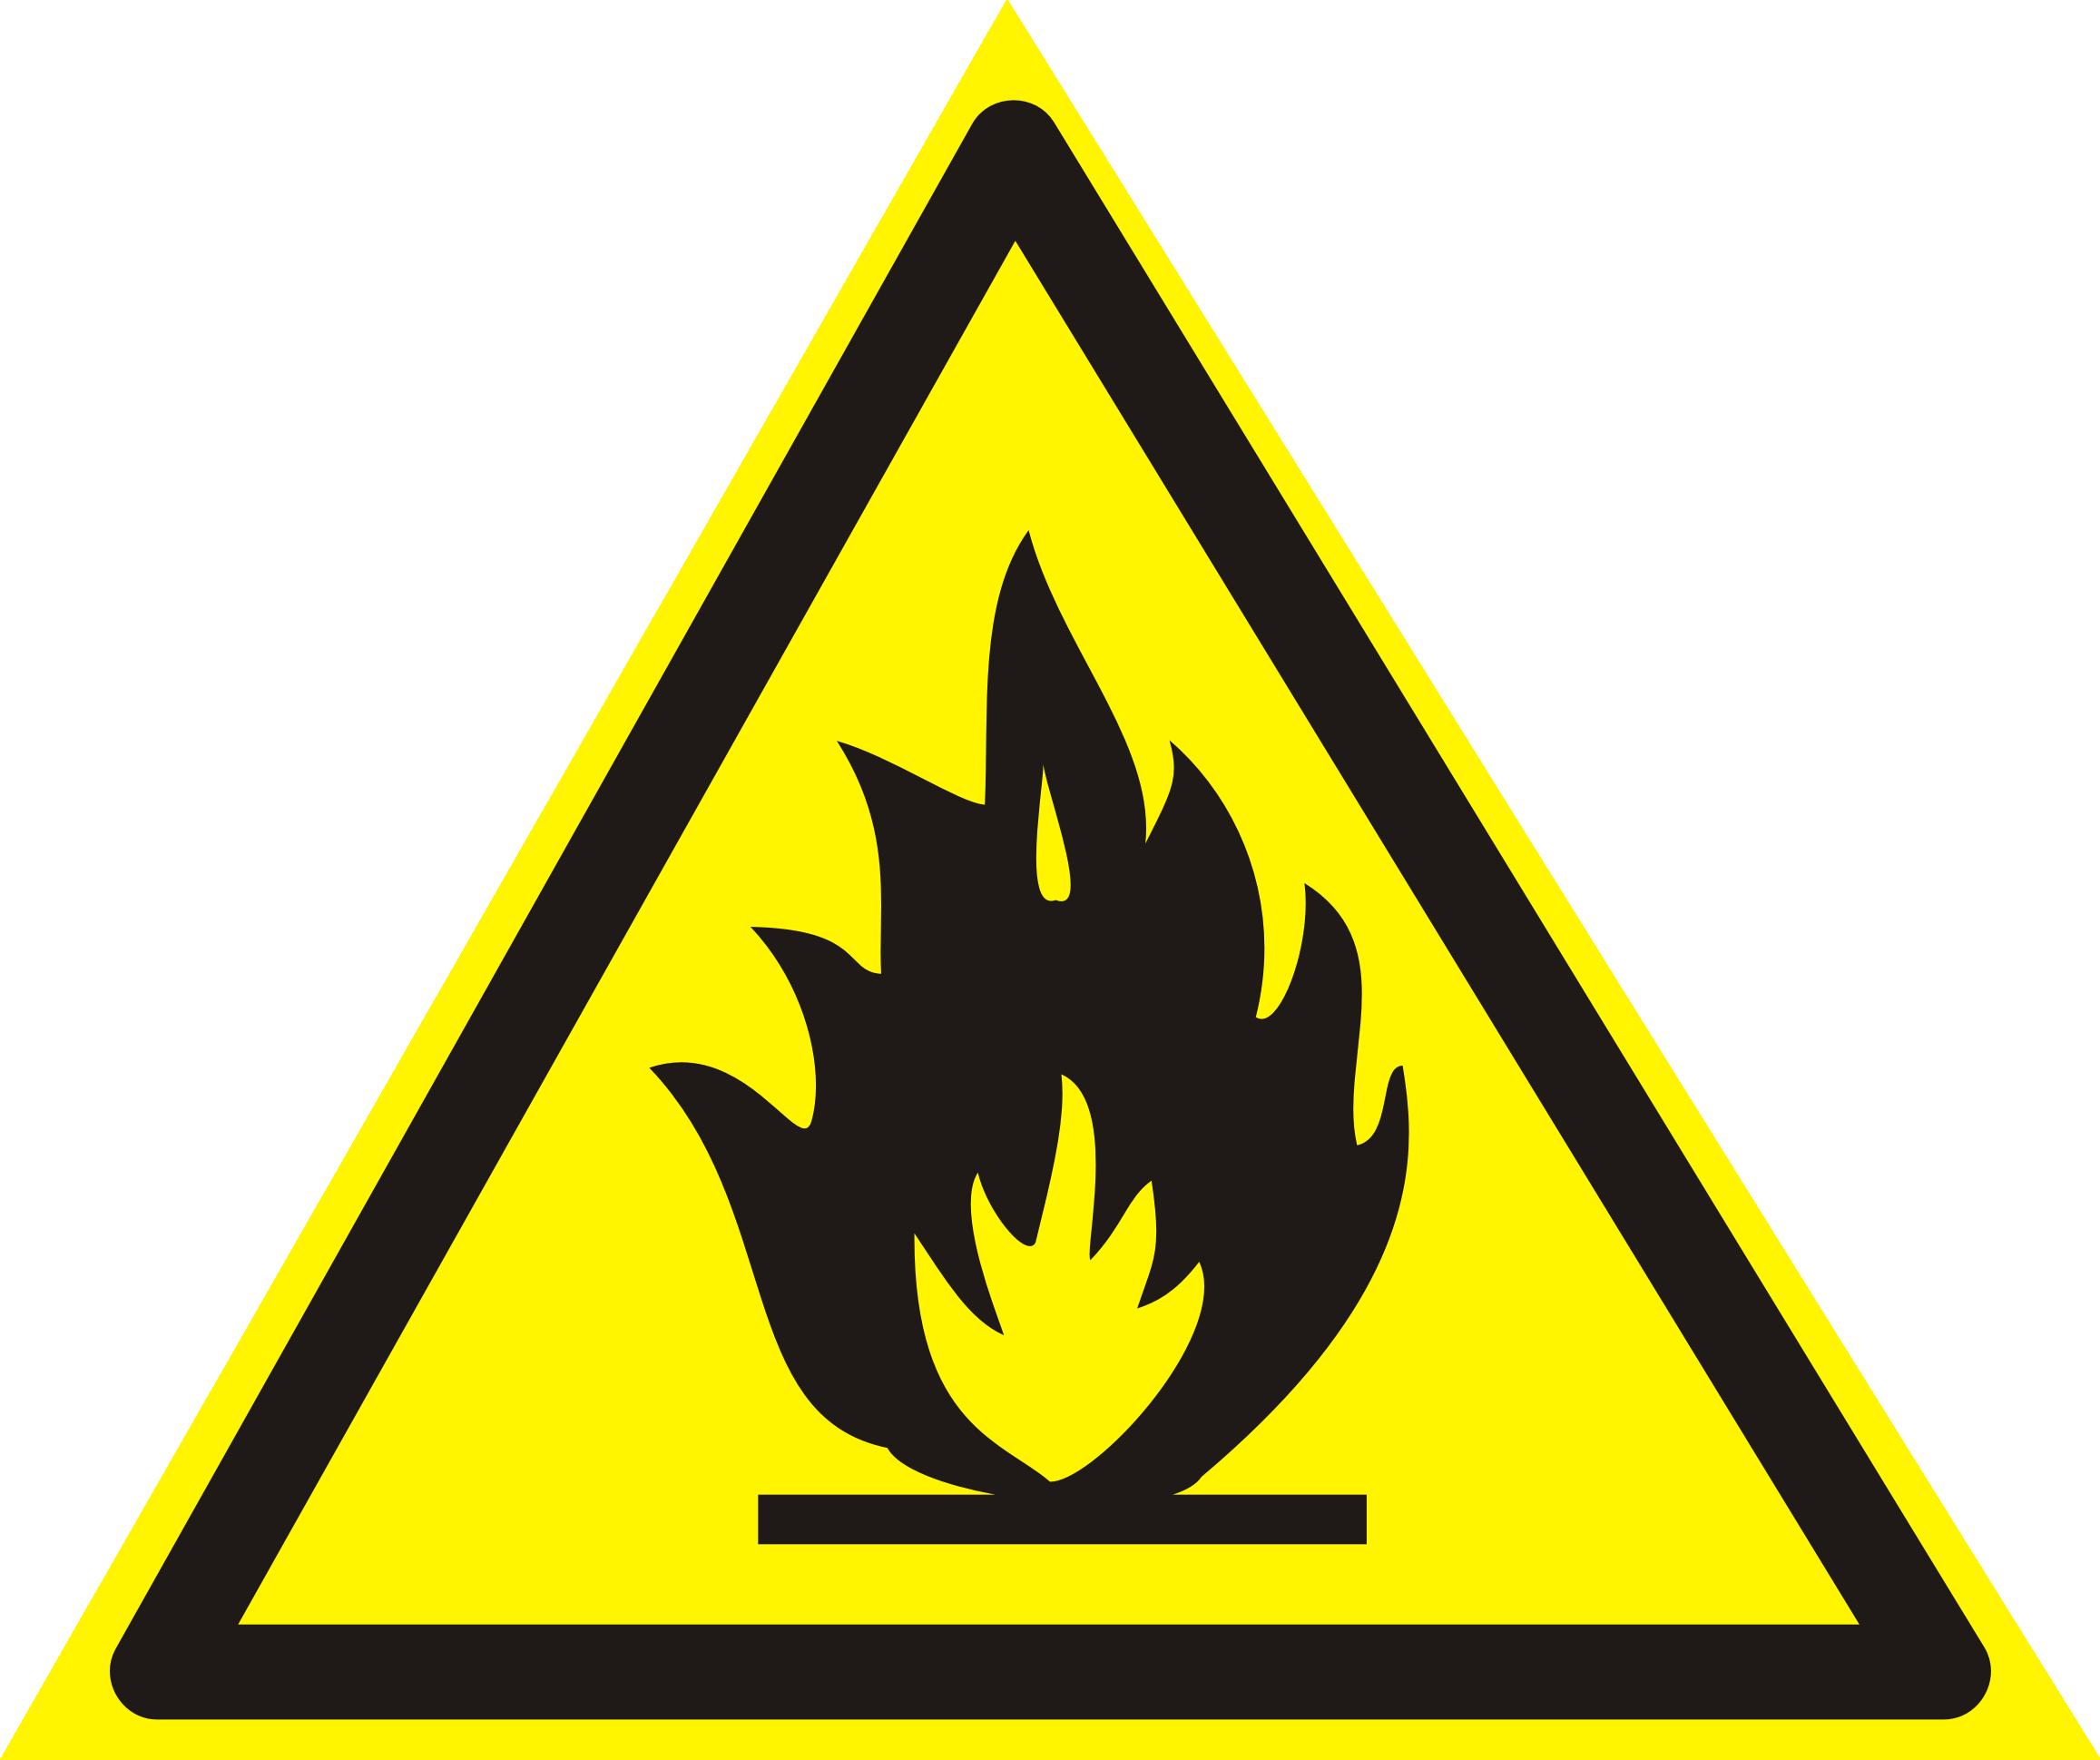 Fire hazard symbol smbolos de aviso warning signs pinterest fire hazard symbol buycottarizona Gallery